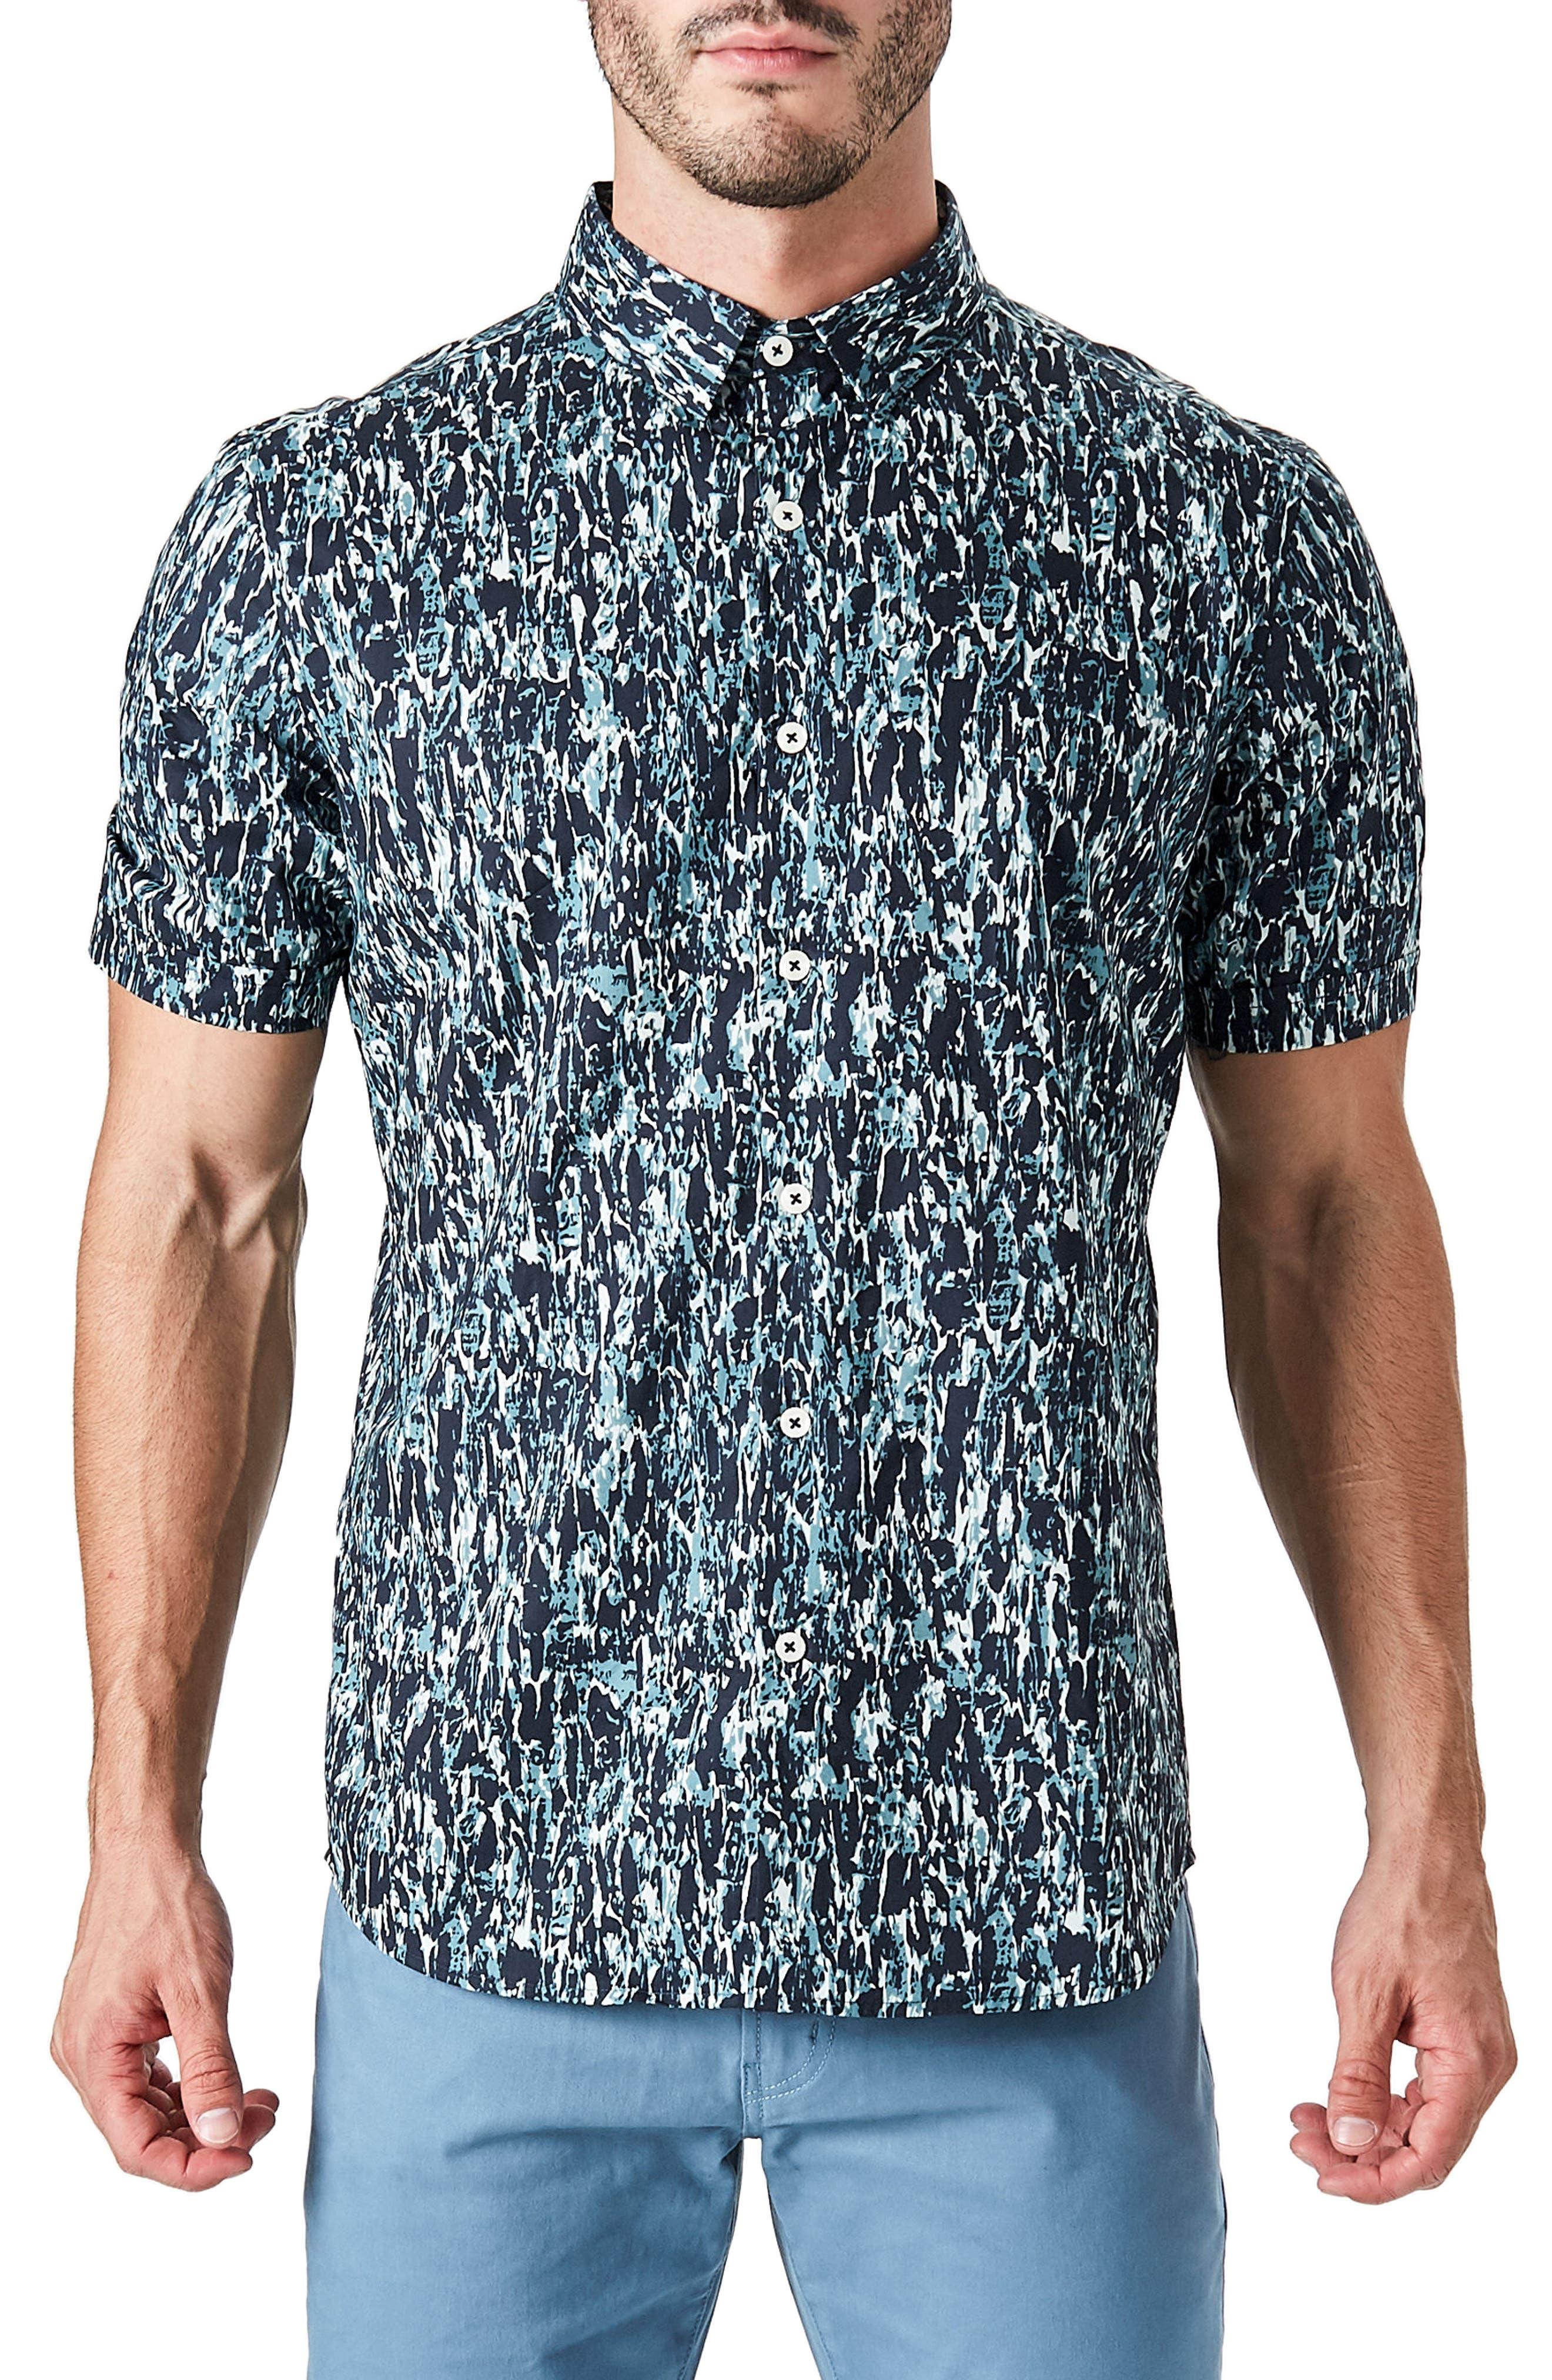 Universal Sound Woven Shirt,                             Main thumbnail 1, color,                             MIDNIGHT G